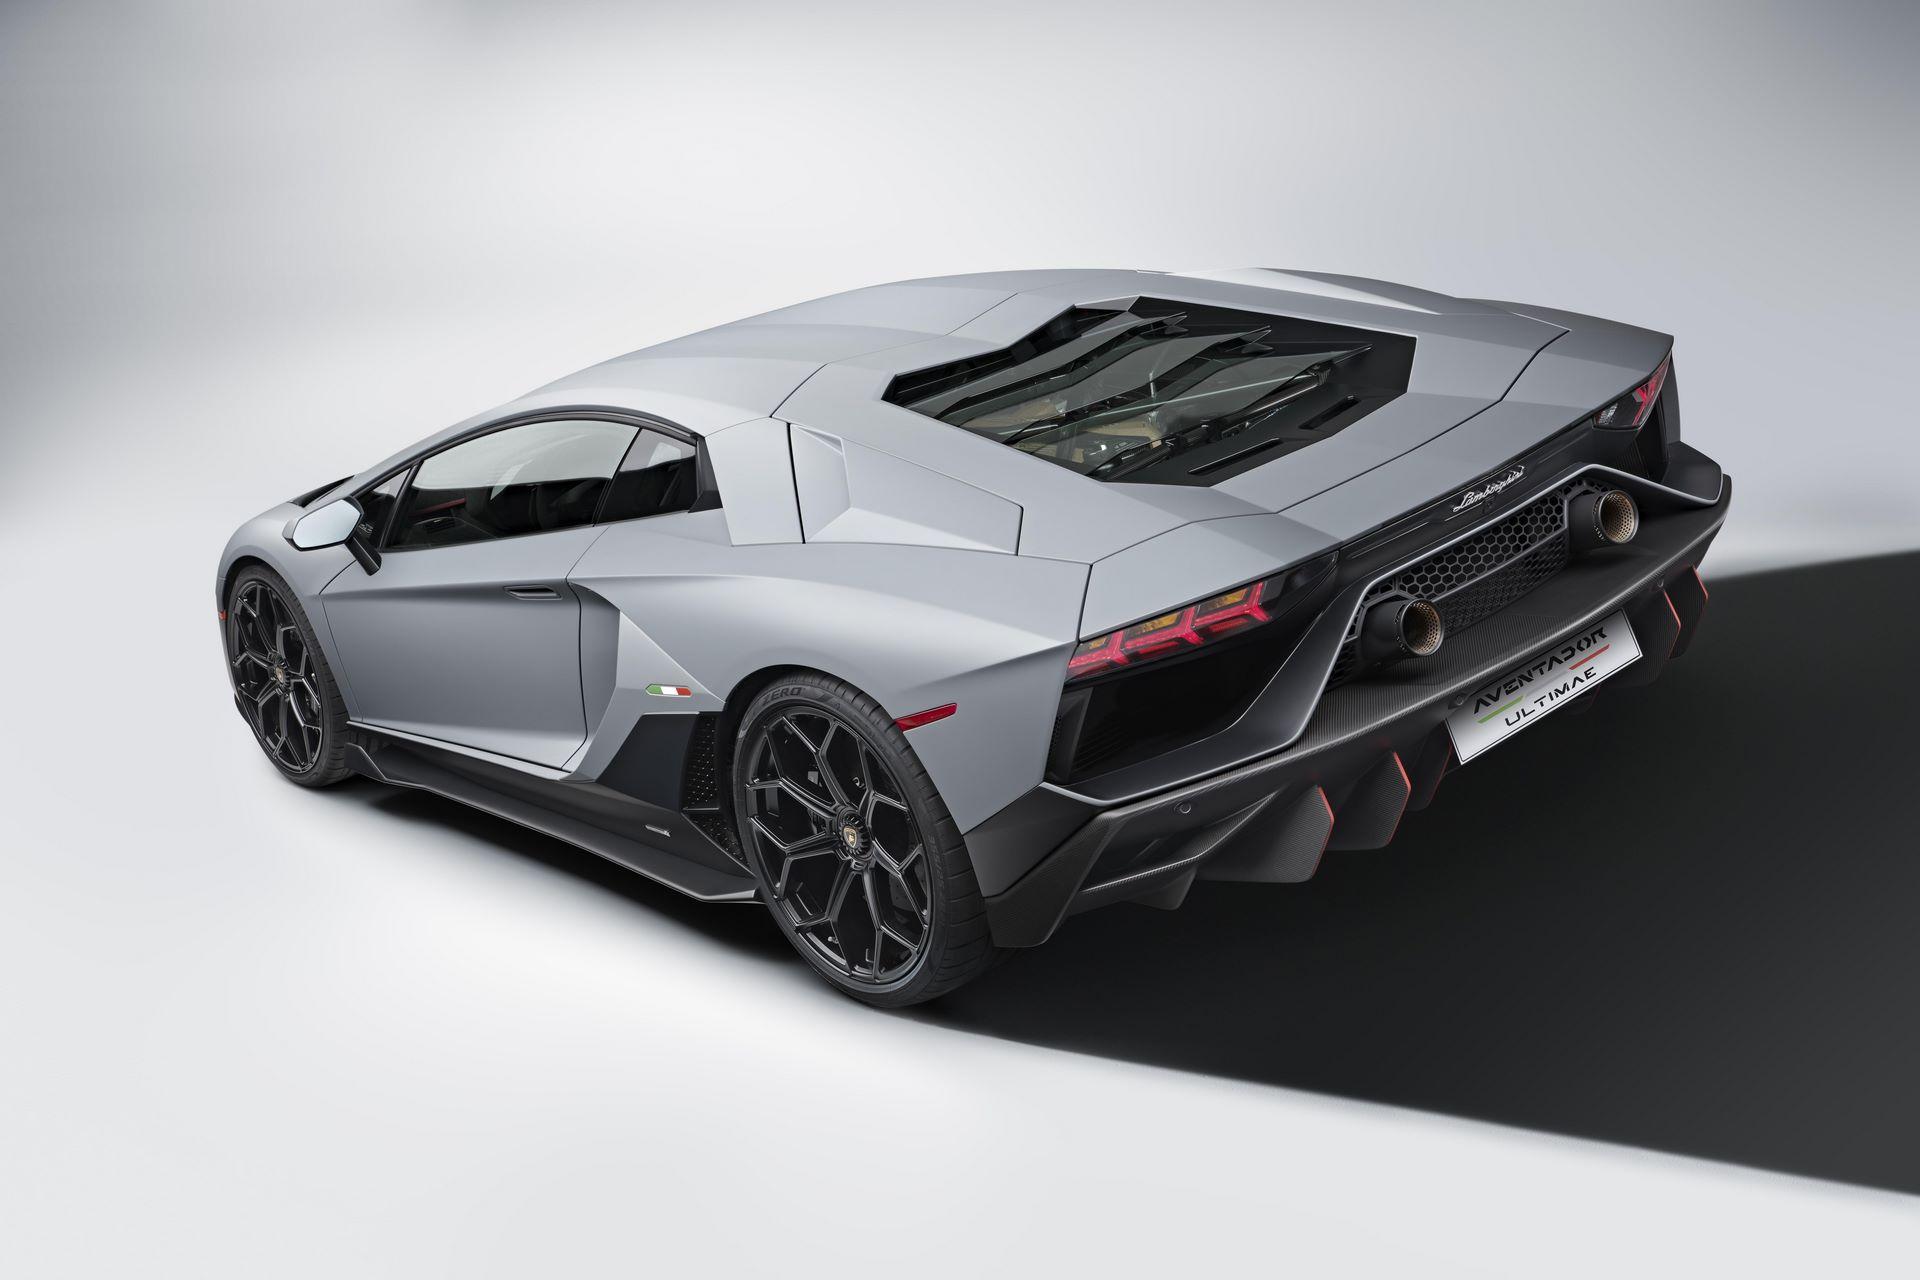 Lamborghini-Aventador-LP780-4-Ultimae-29